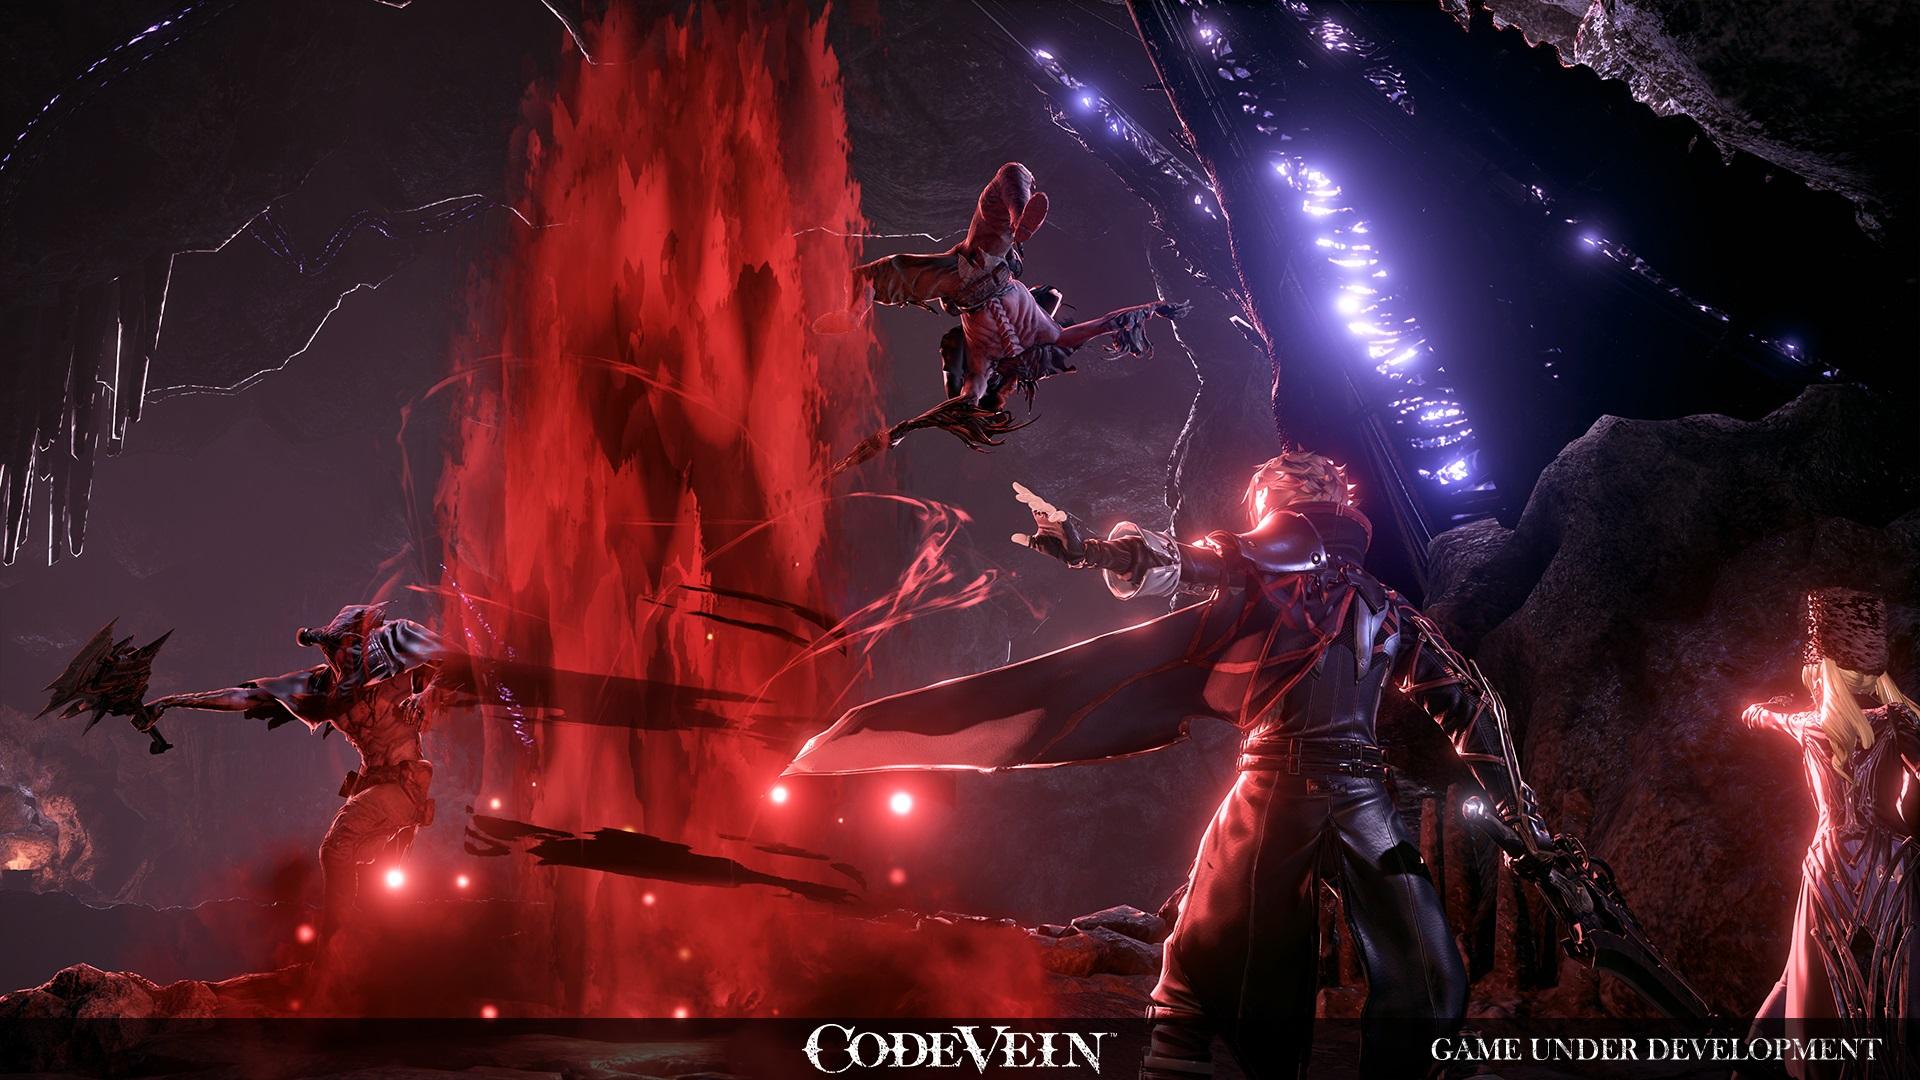 Bandai Namco Announces Code Vein